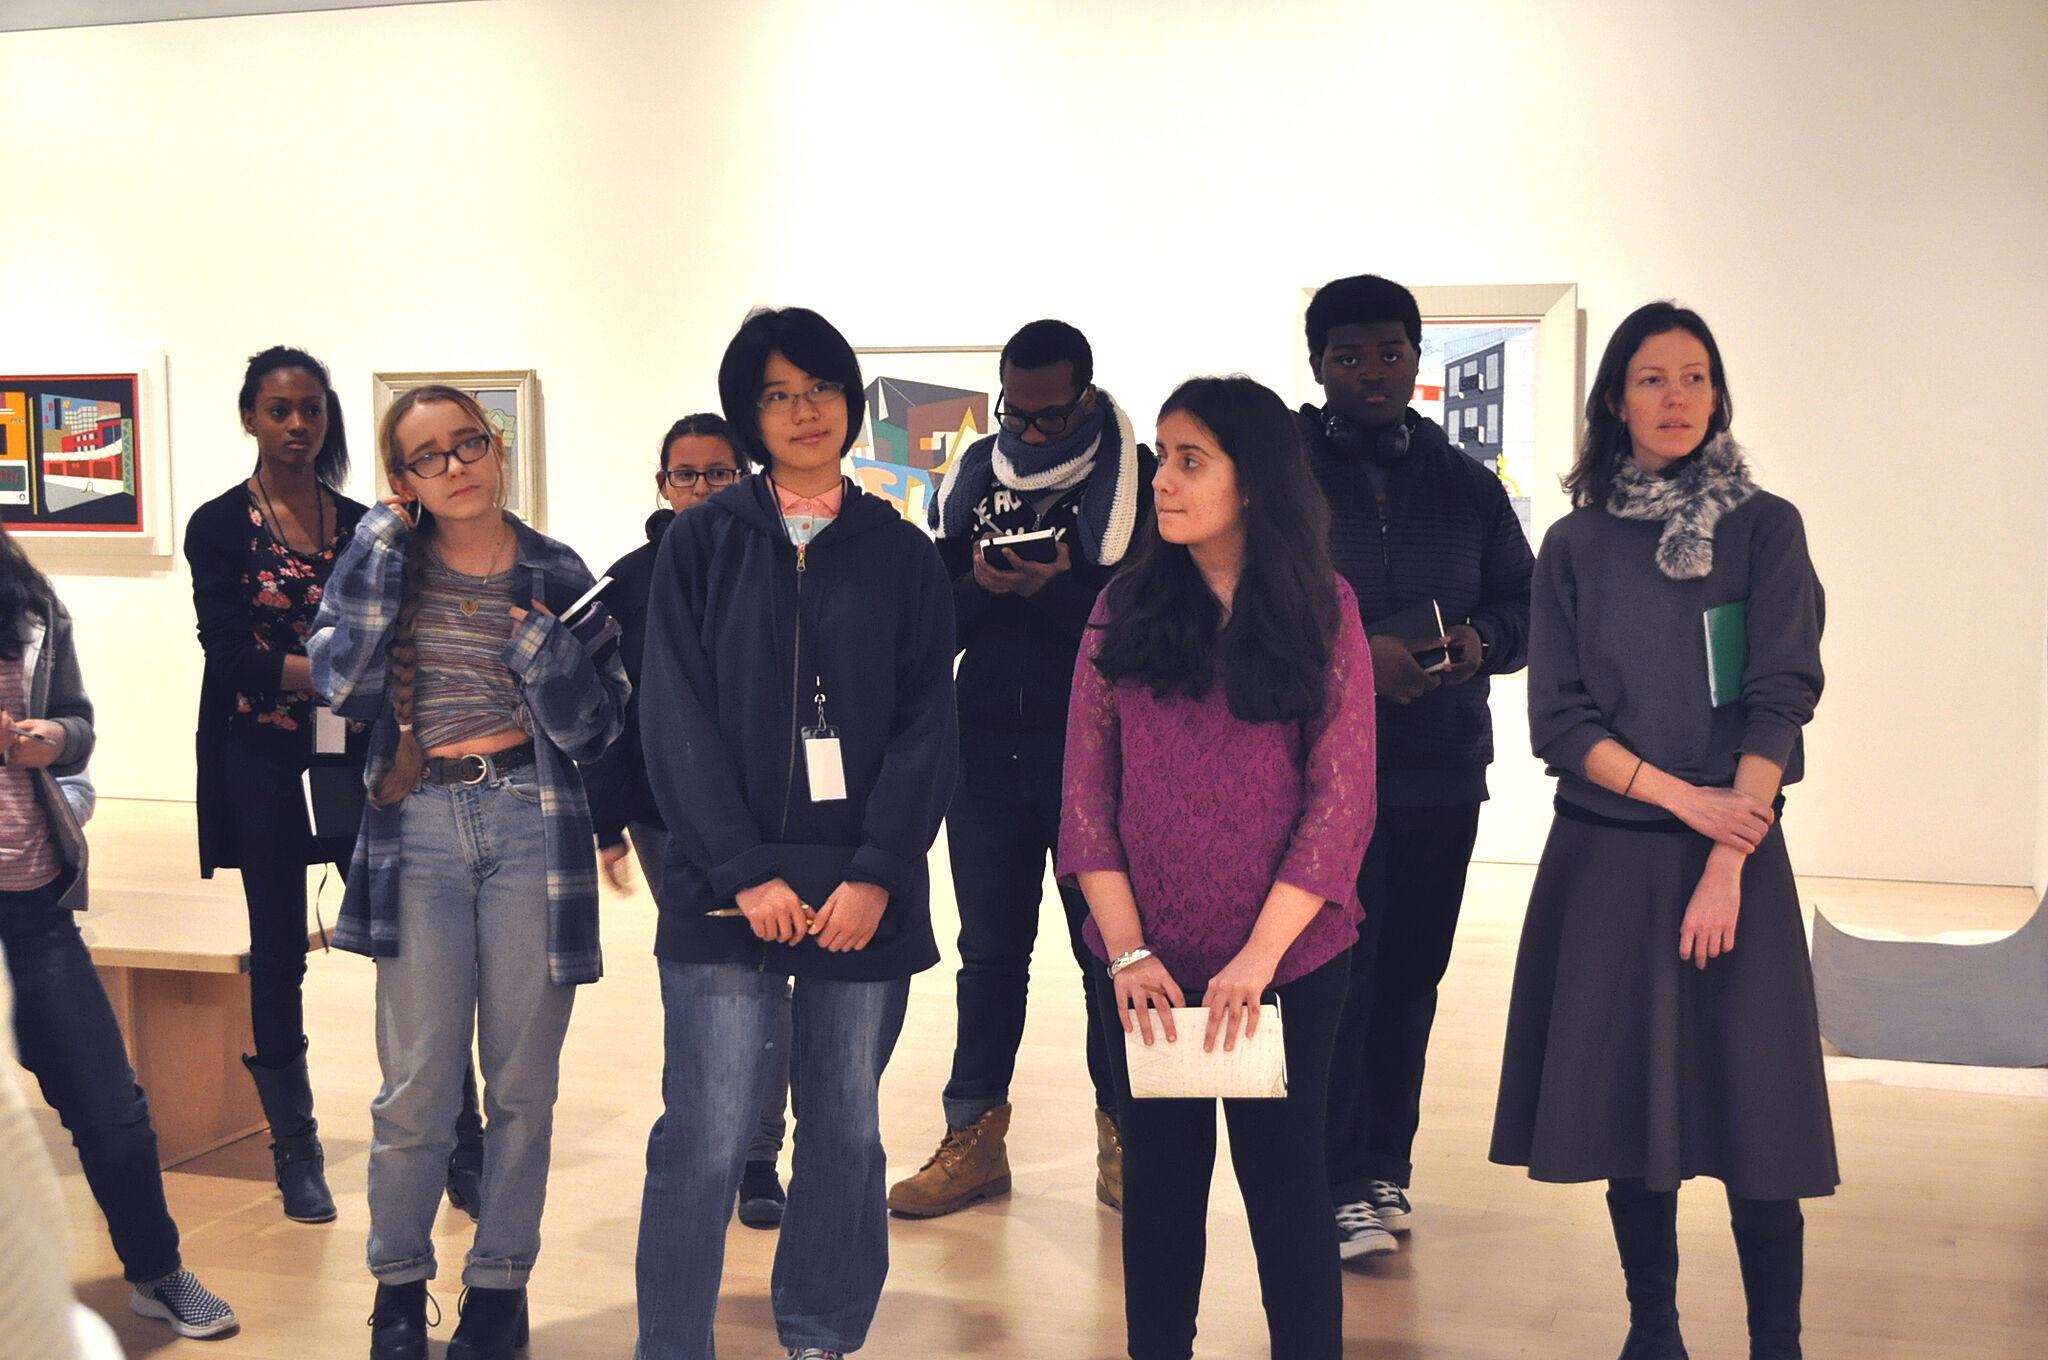 Participants discussing art works